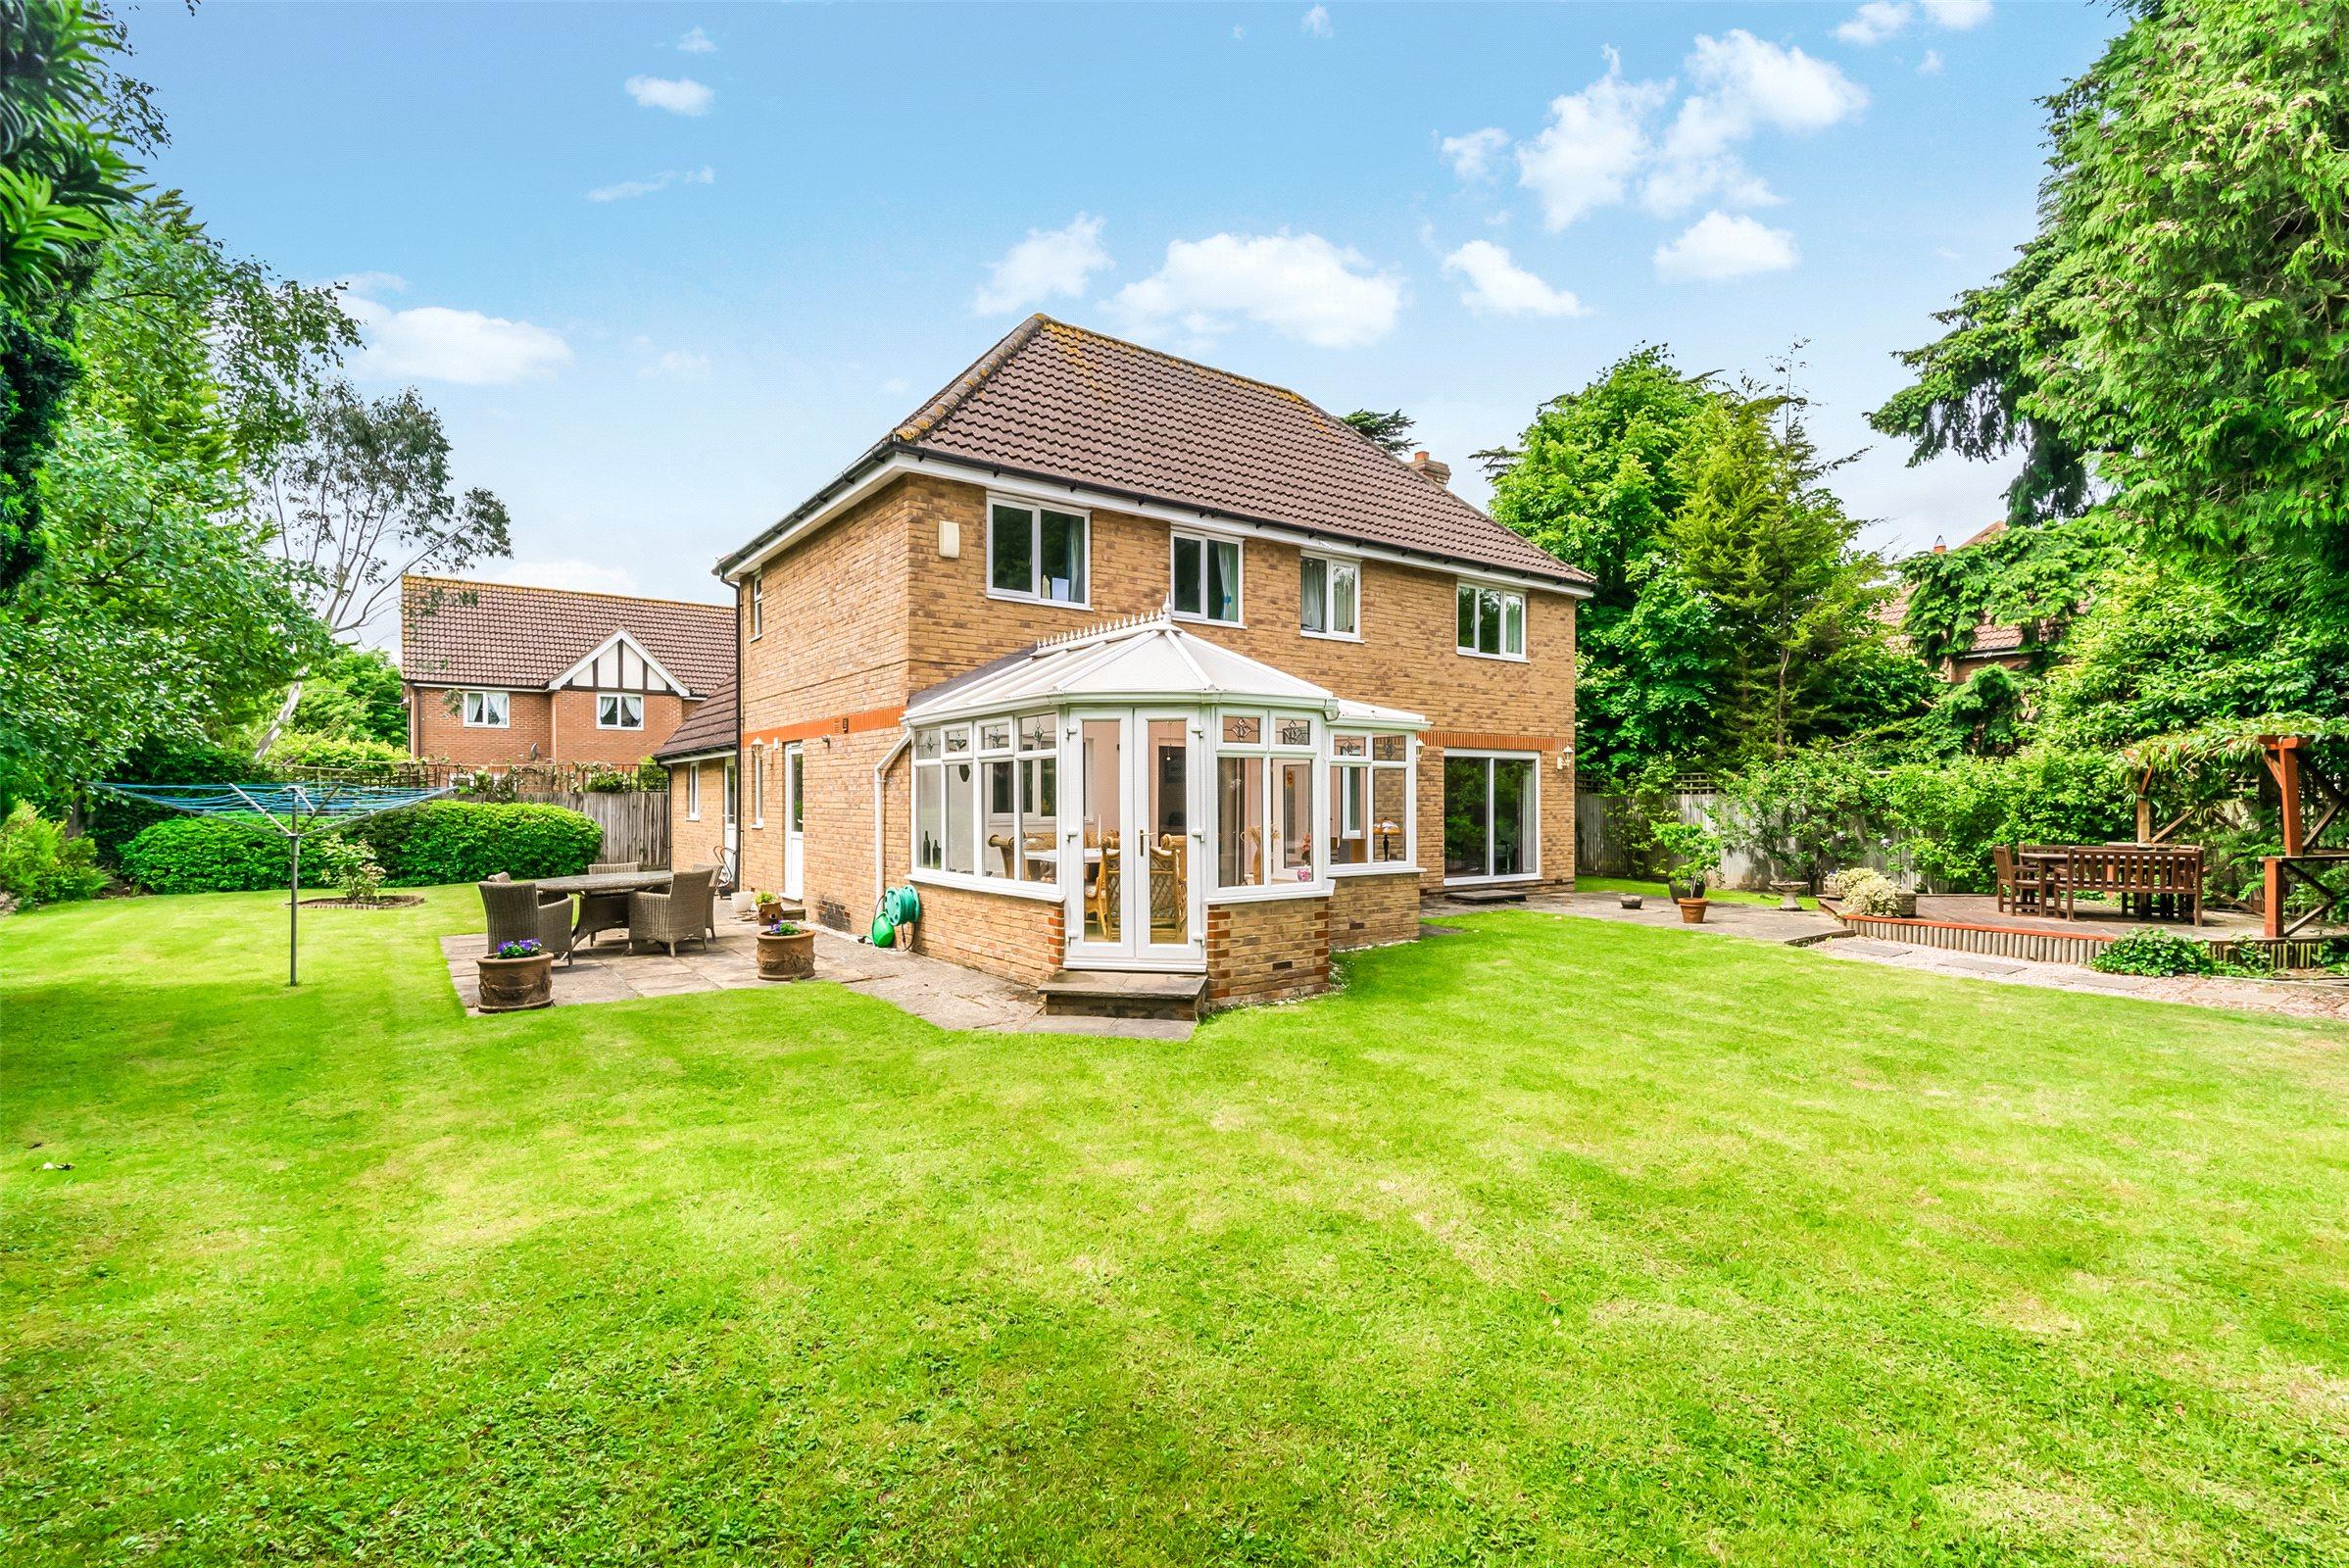 5 Bedrooms Detached House for sale in Bonehurst Road, Horley, Surrey, RH6